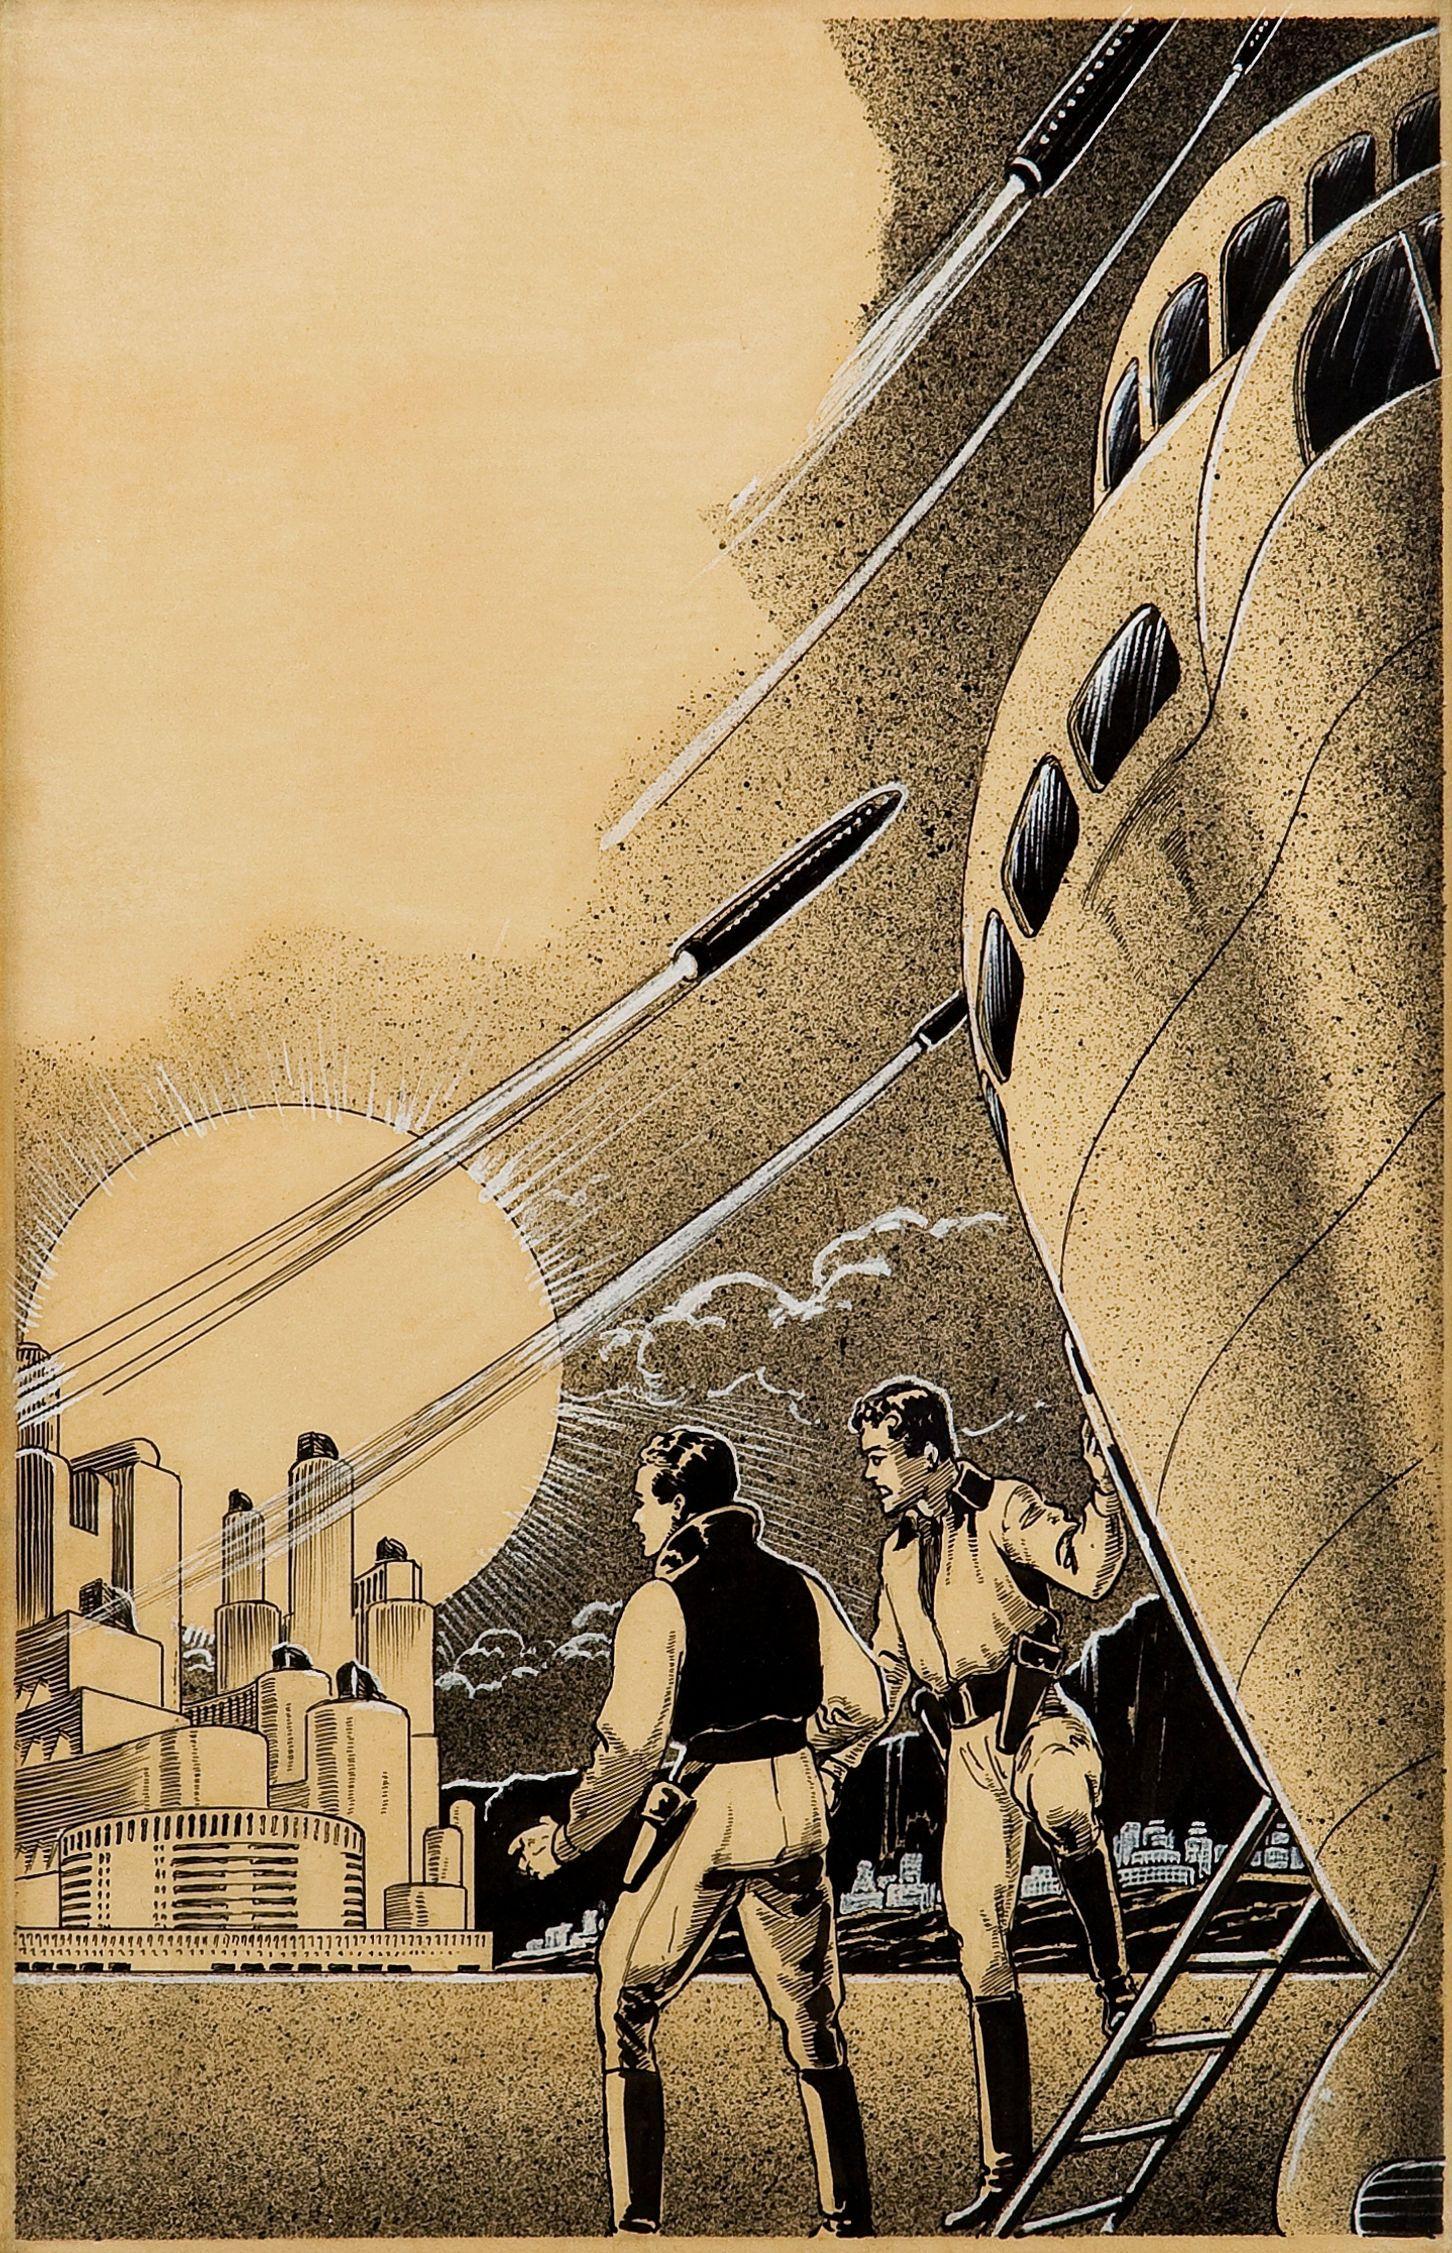 frank r. paul - rockets and men, science fiction pulp interior story illustration